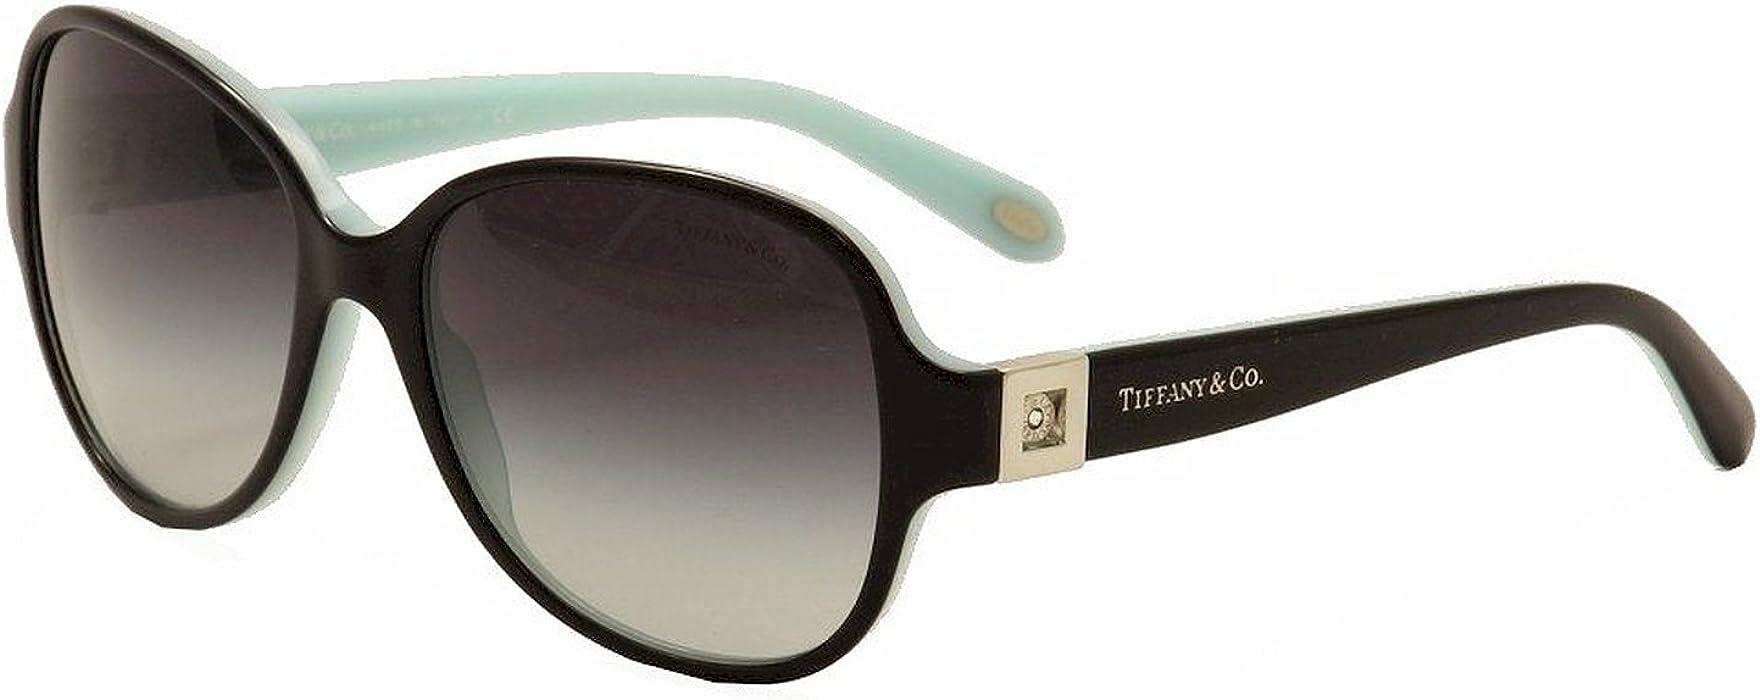 505de84e55 Amazon.com  Tiffany Tf4046b Butterfly Interchangeable Temple Insert Black  Azure Sunglasses 80553c  Clothing